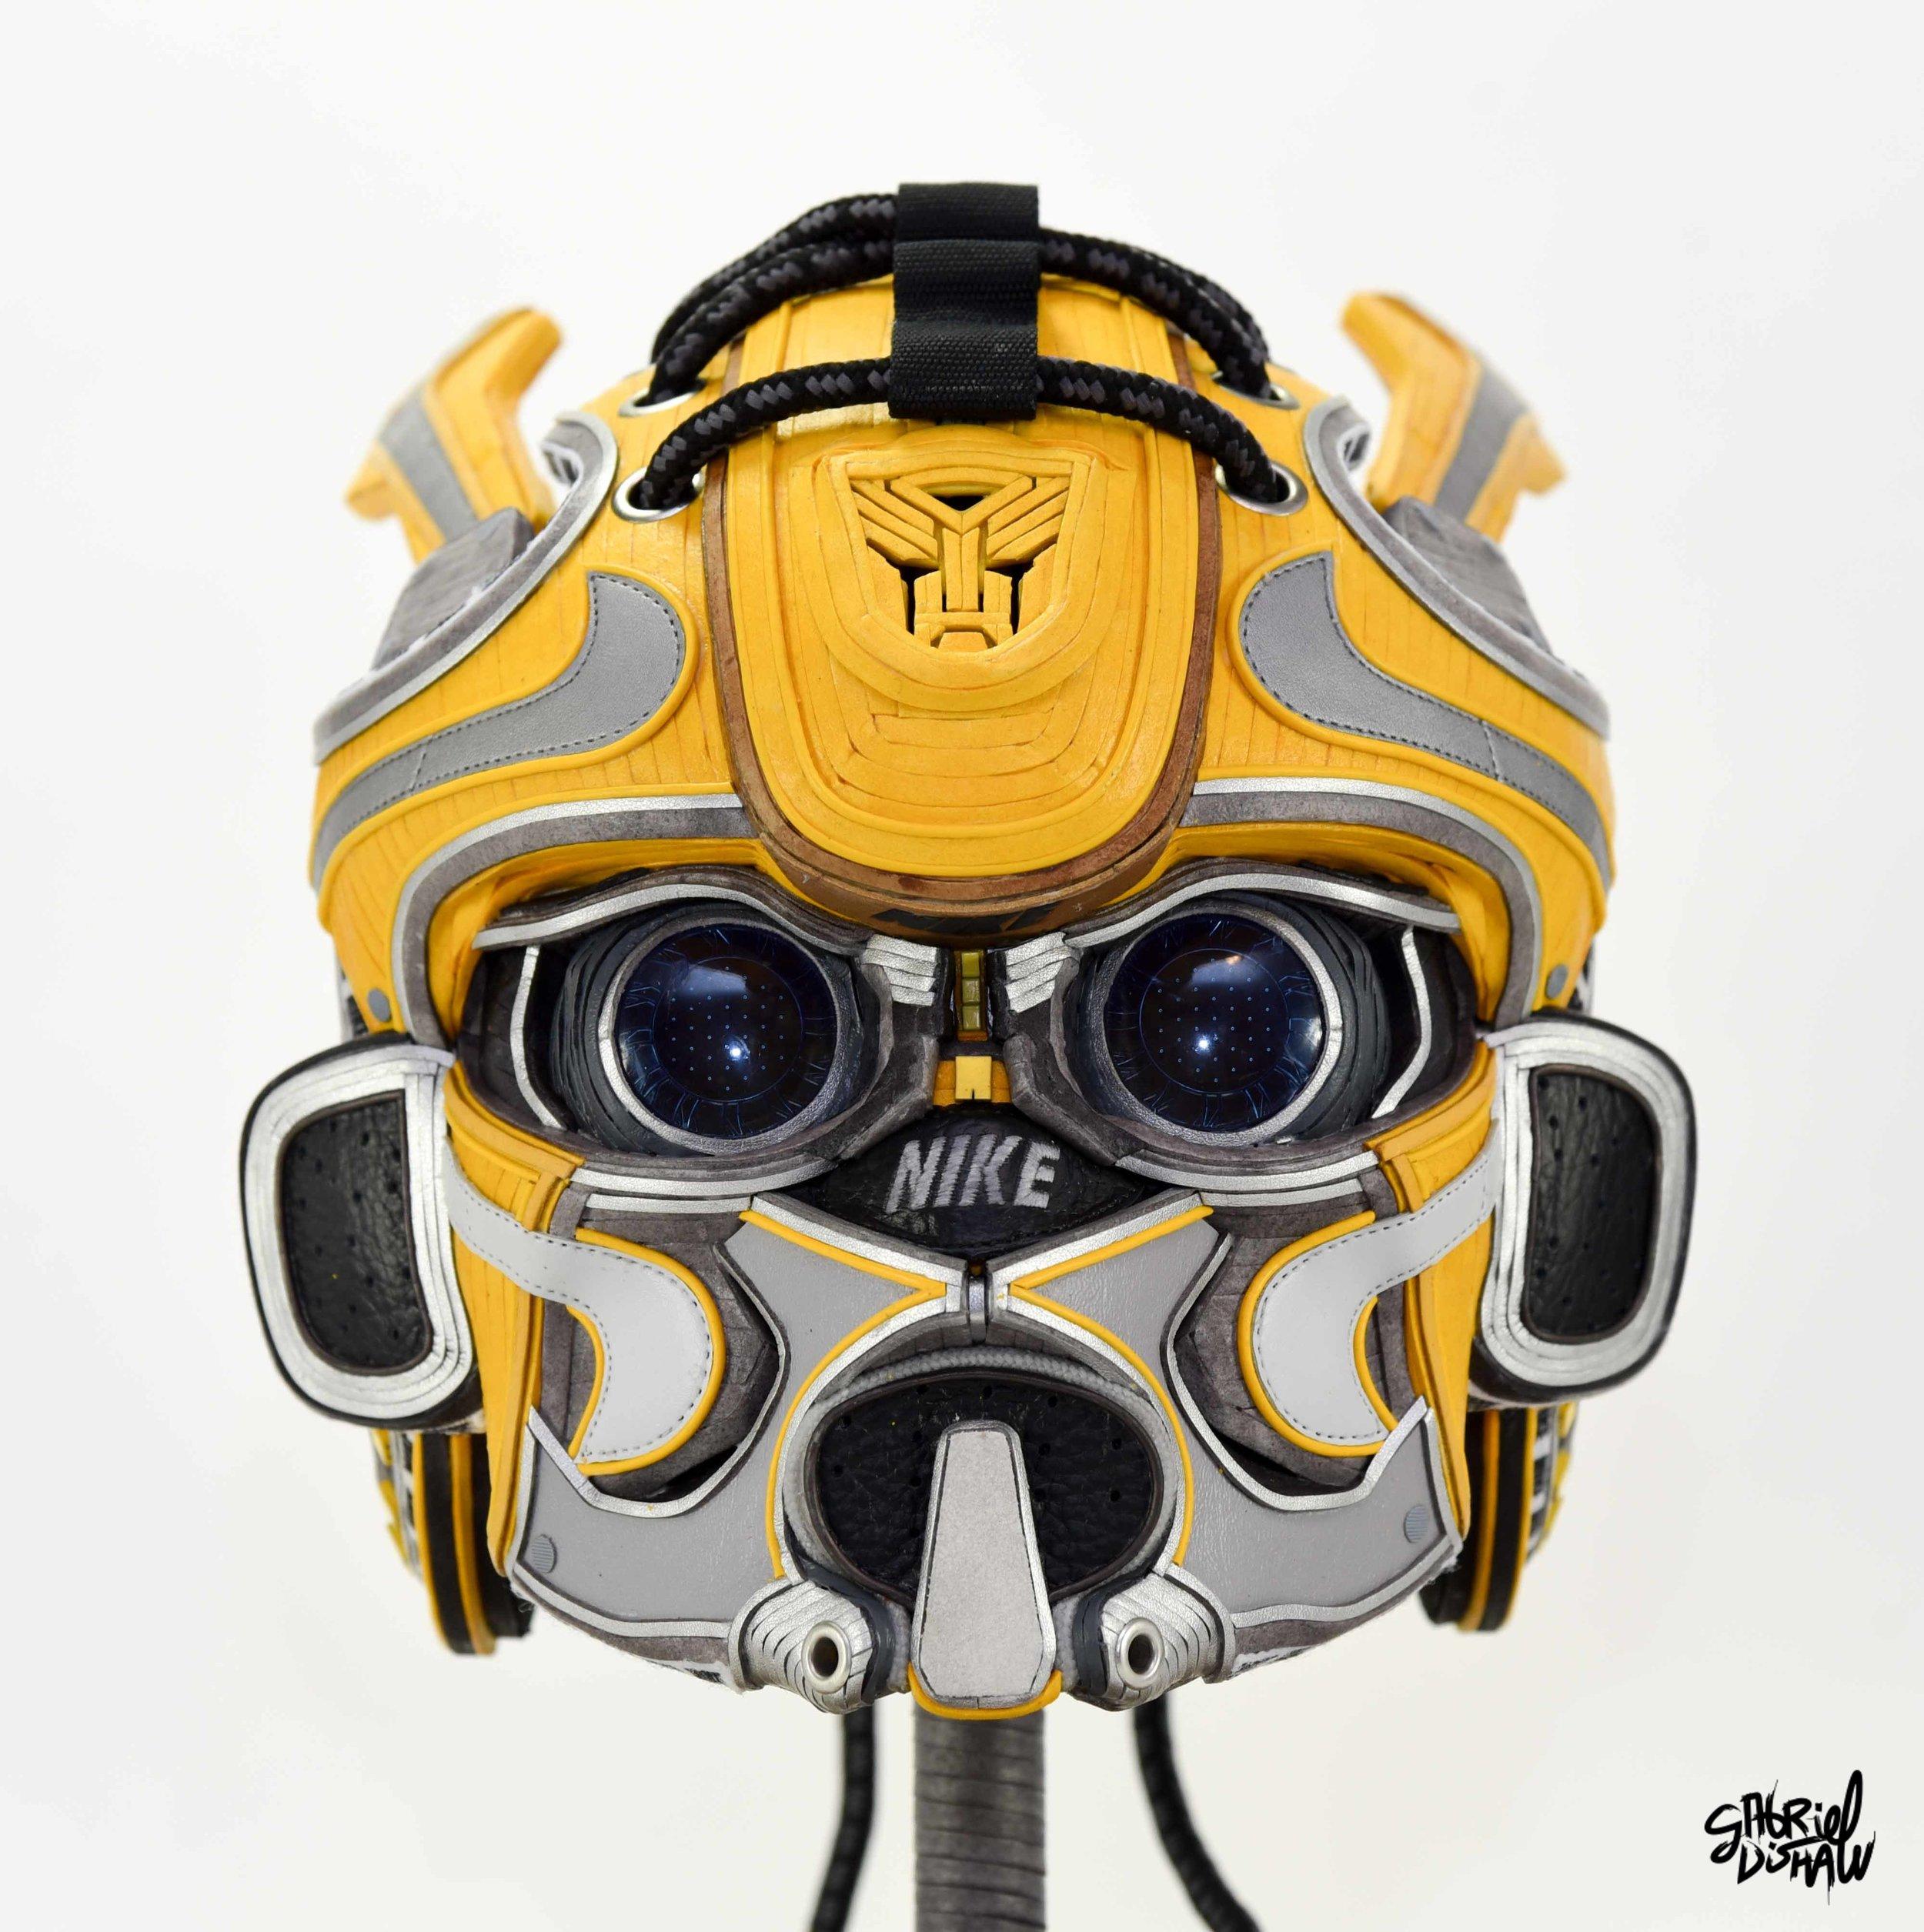 Gabriel Dishaw Bumblebee Swoosh-8369.jpg